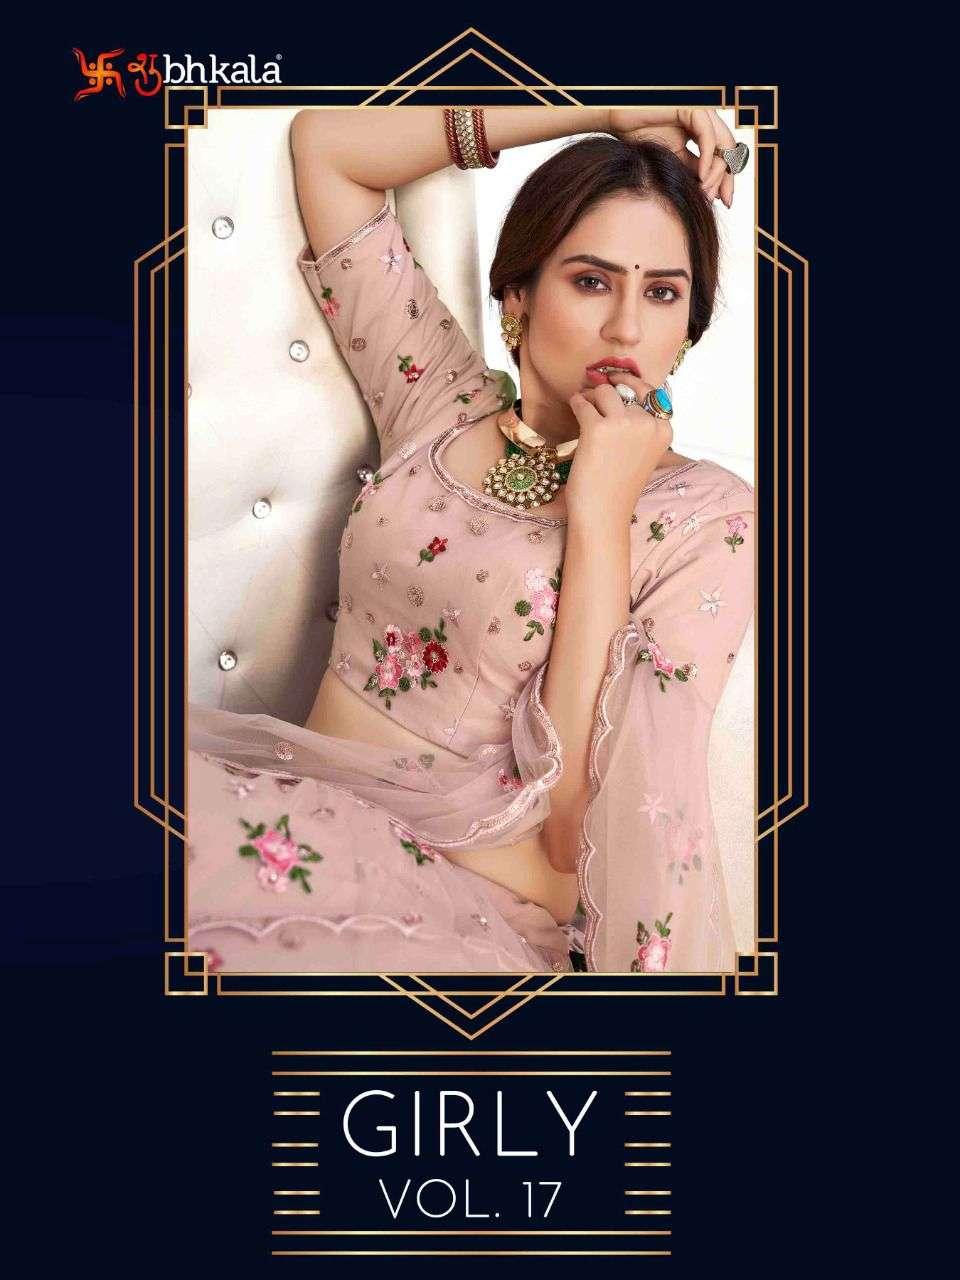 Shubhkala Girly Vol 17 By Khusboo Exclusive Designer Lehenga Choli Catalog Supplier